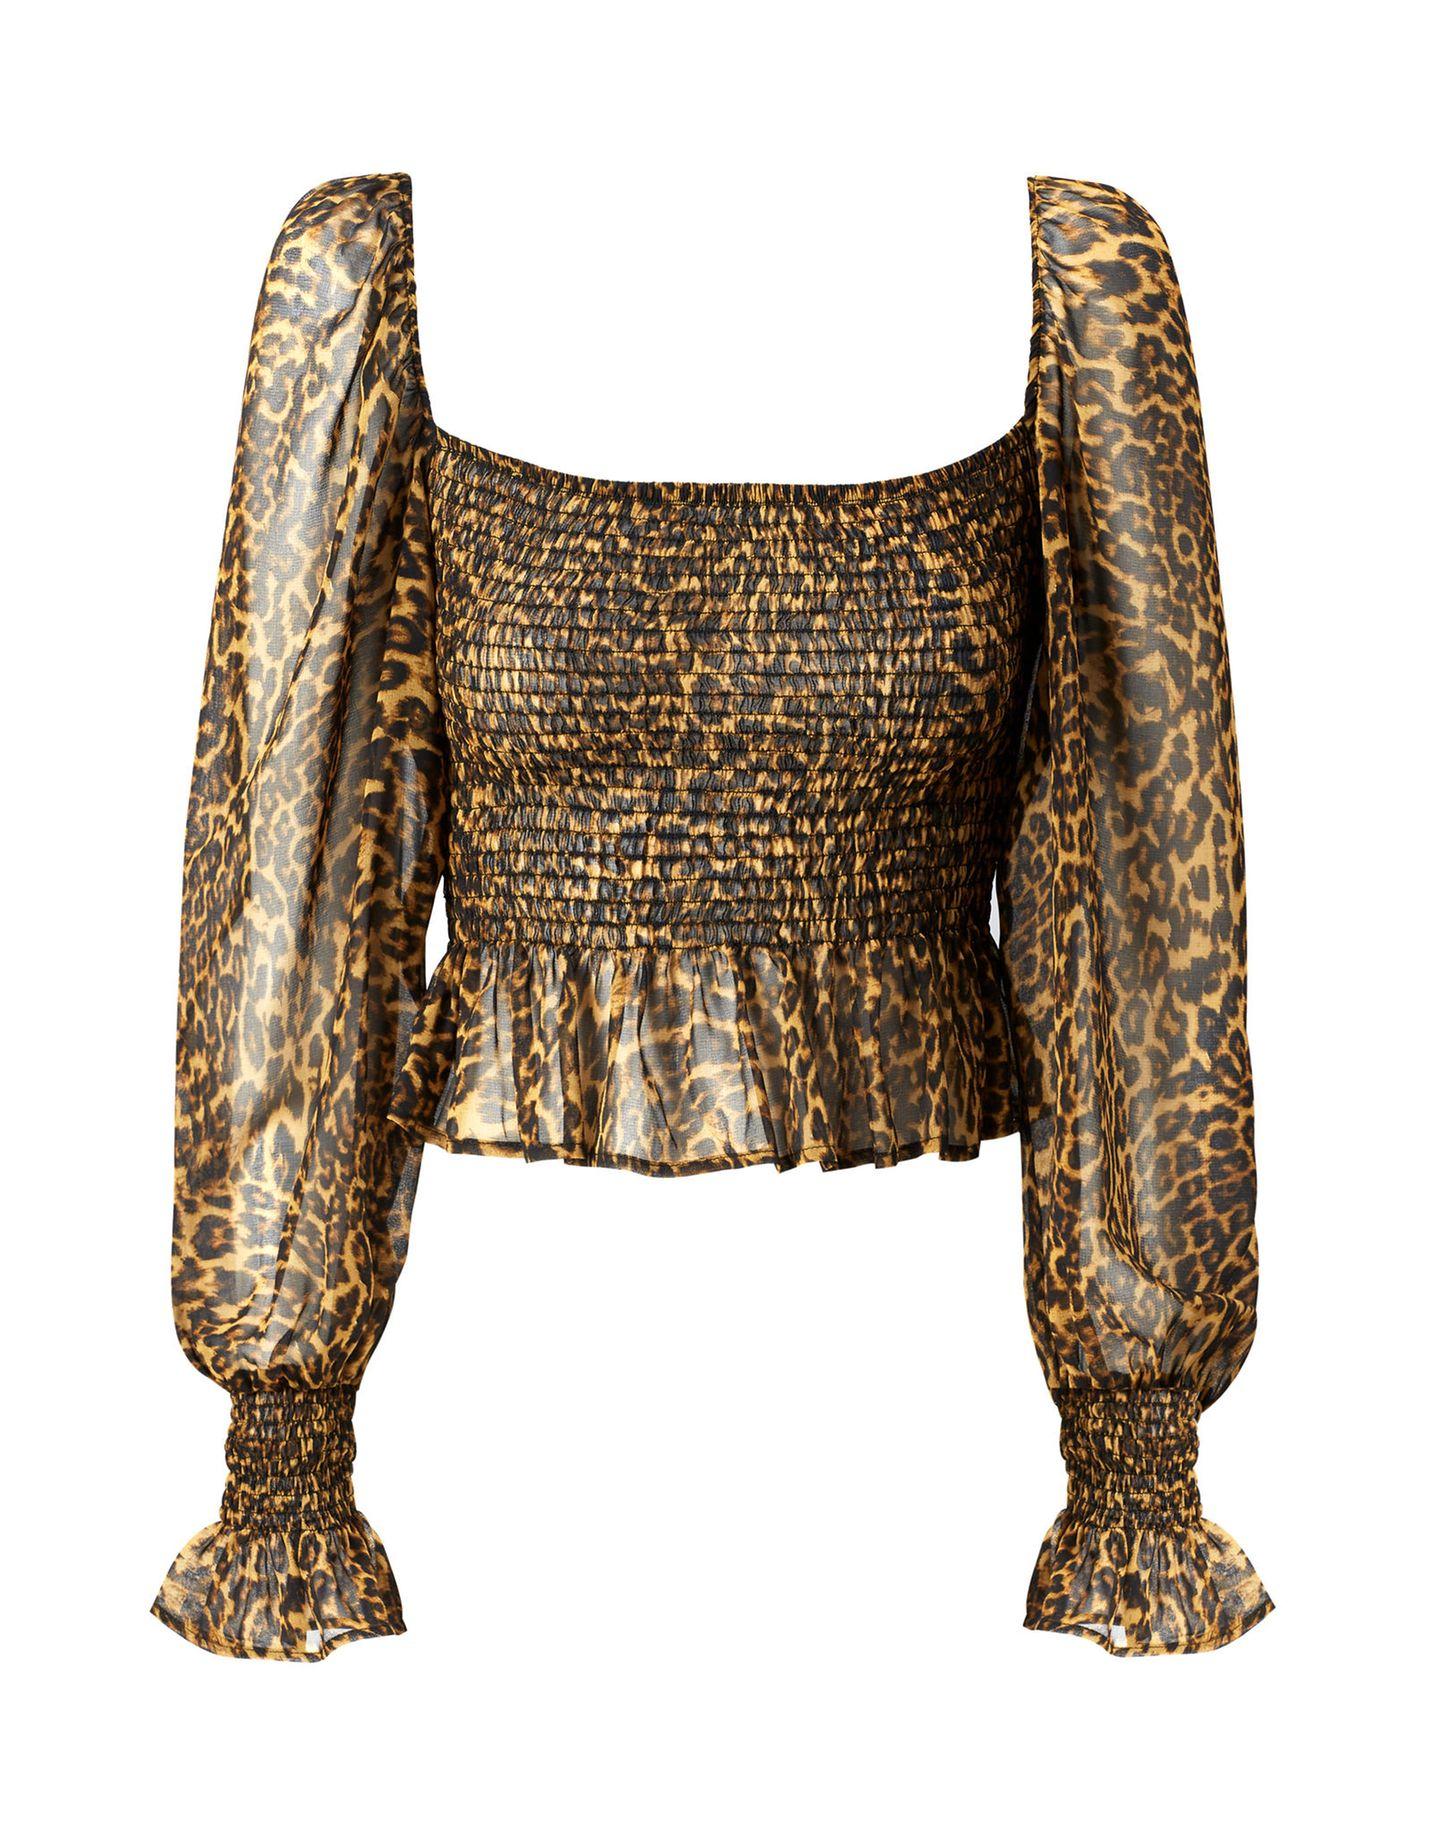 Promi-Looks: Leo-Print Bluse von Mango